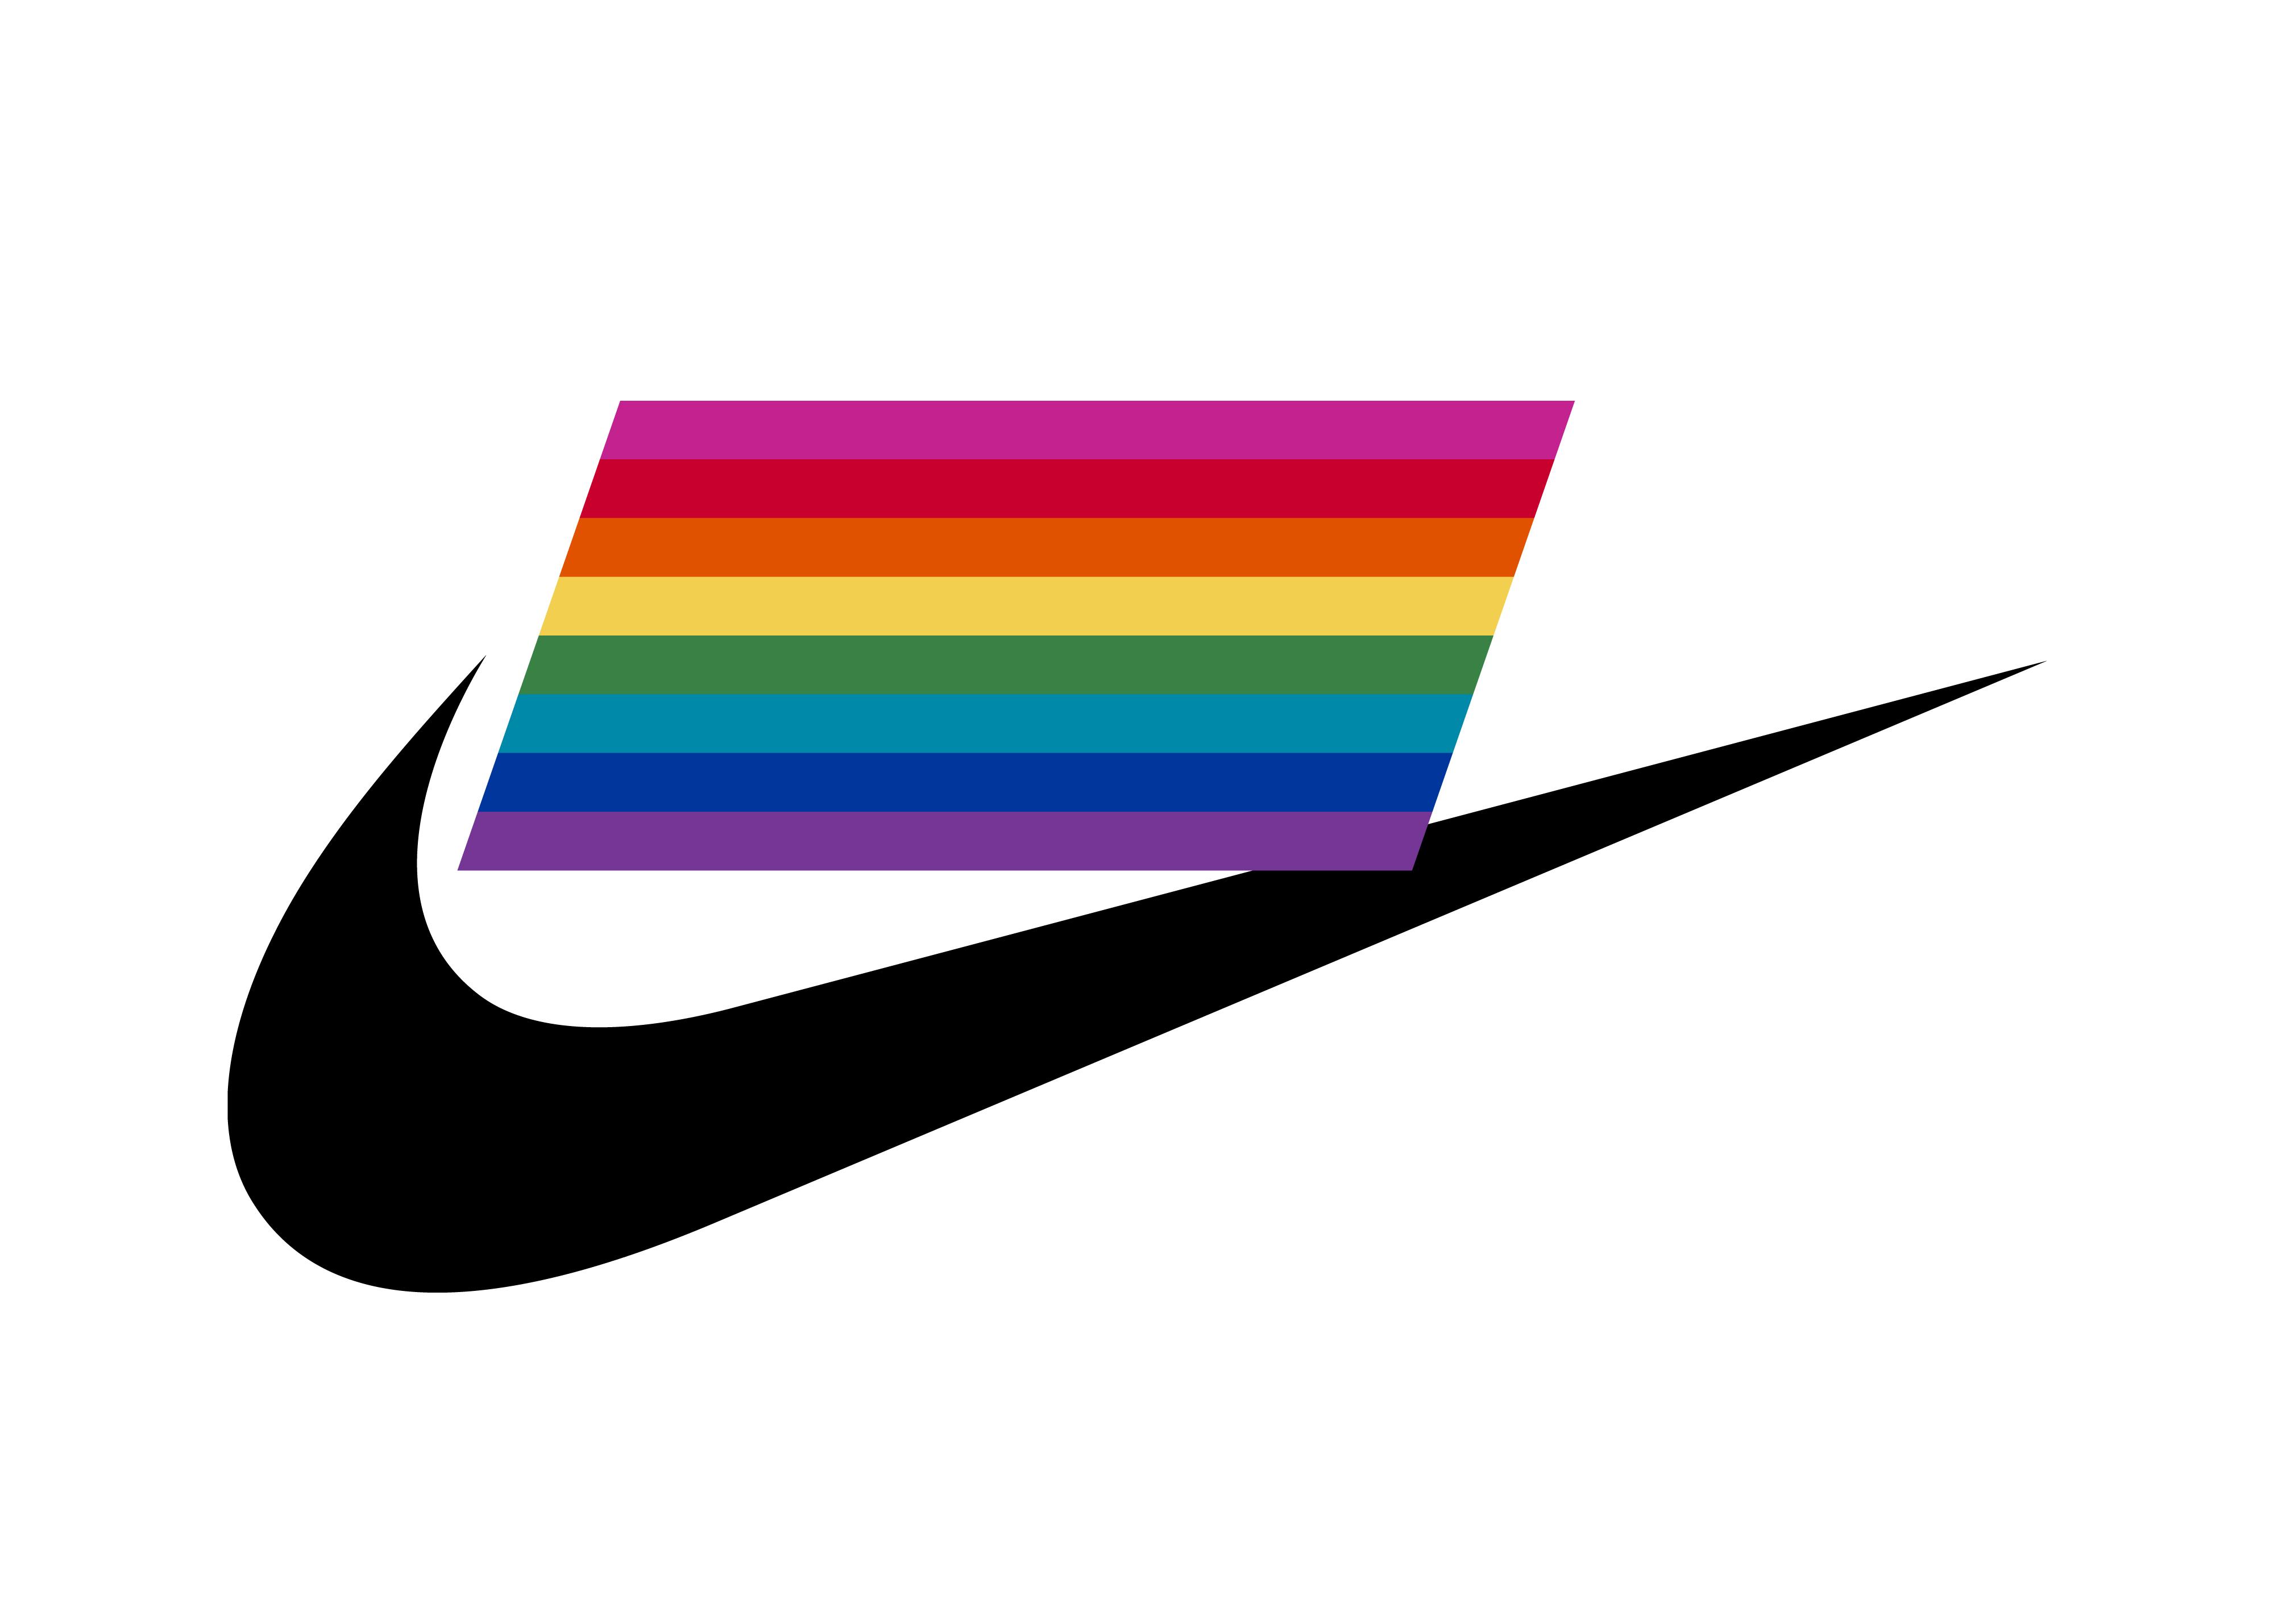 Nike「BETRUE」コレクション<br>プライドフラッグに込められた思い